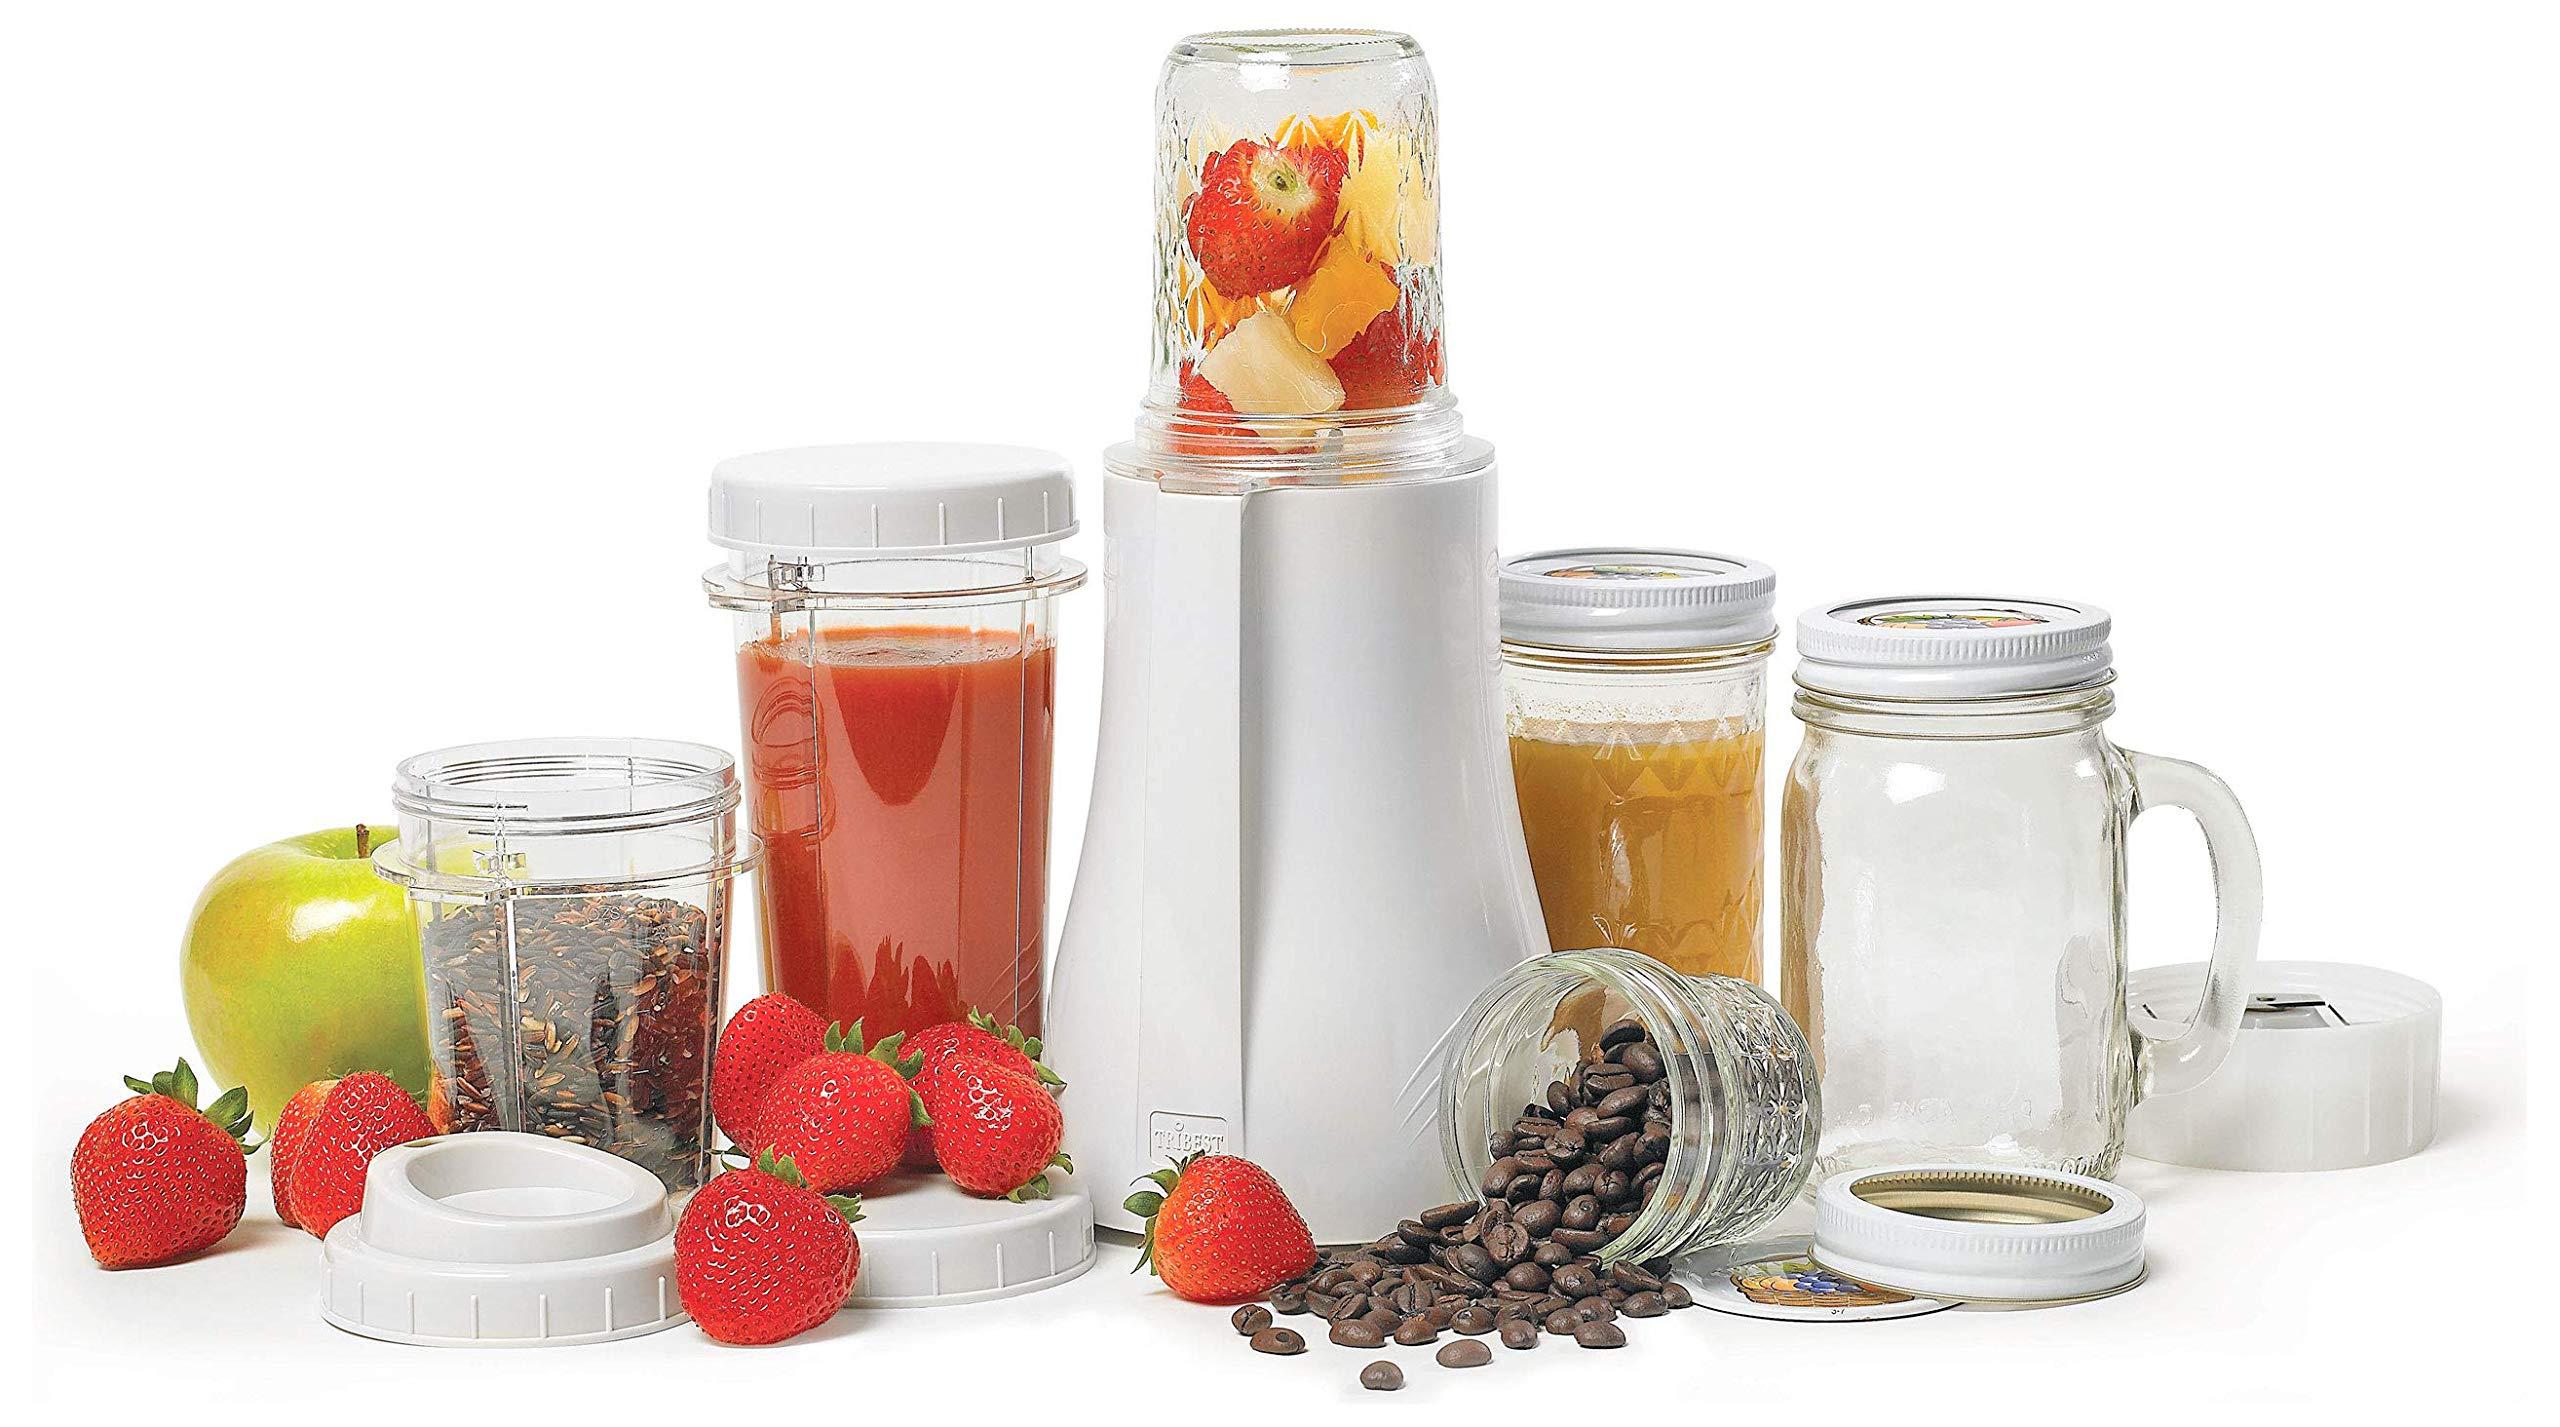 Tribest Single-Serving Mason Jar Personal Blender